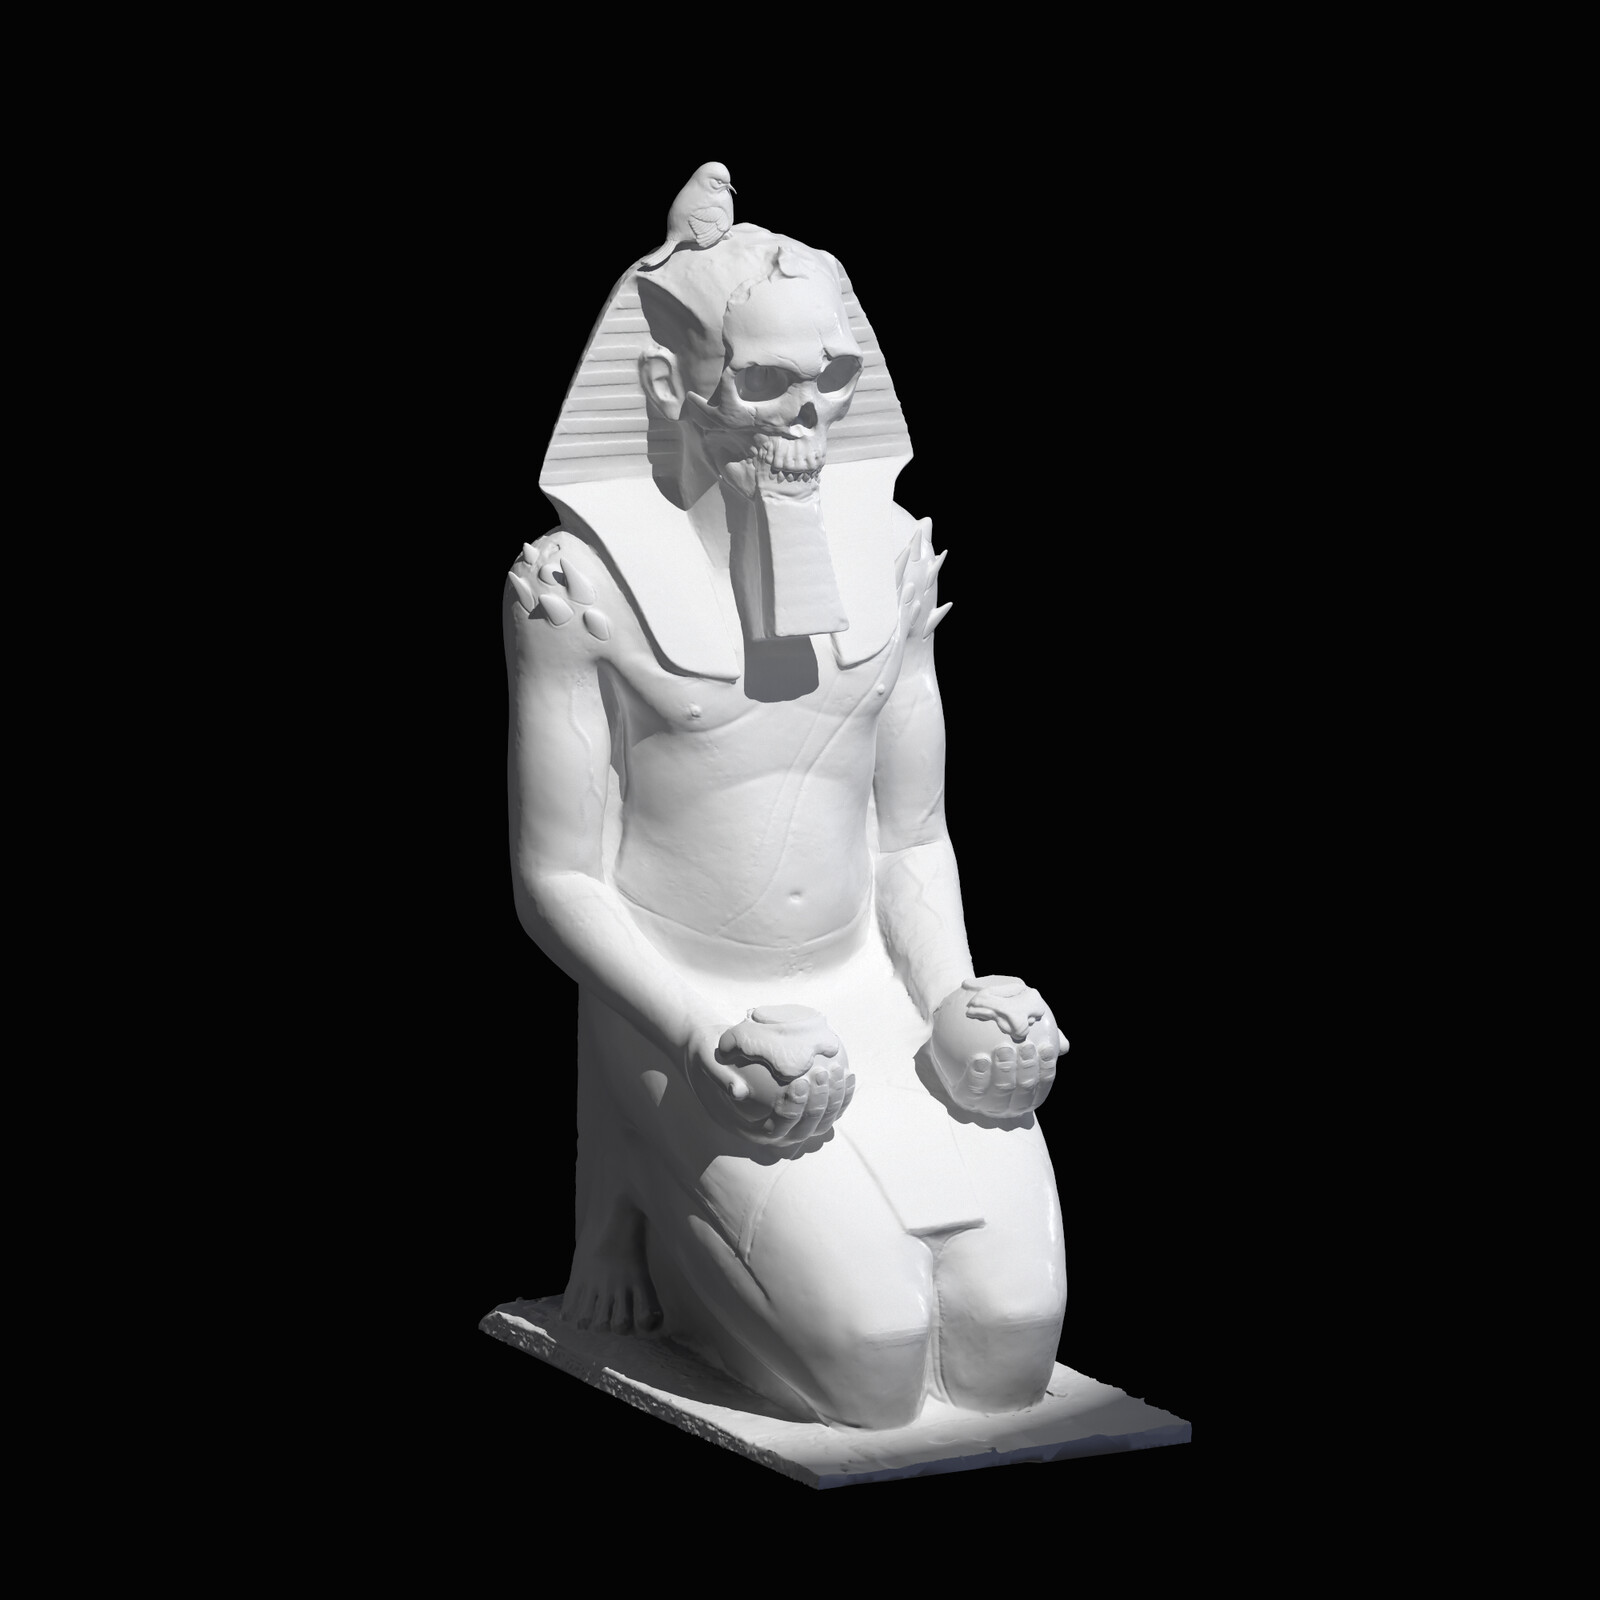 Hatshepsut kneeling with gold and bird concept